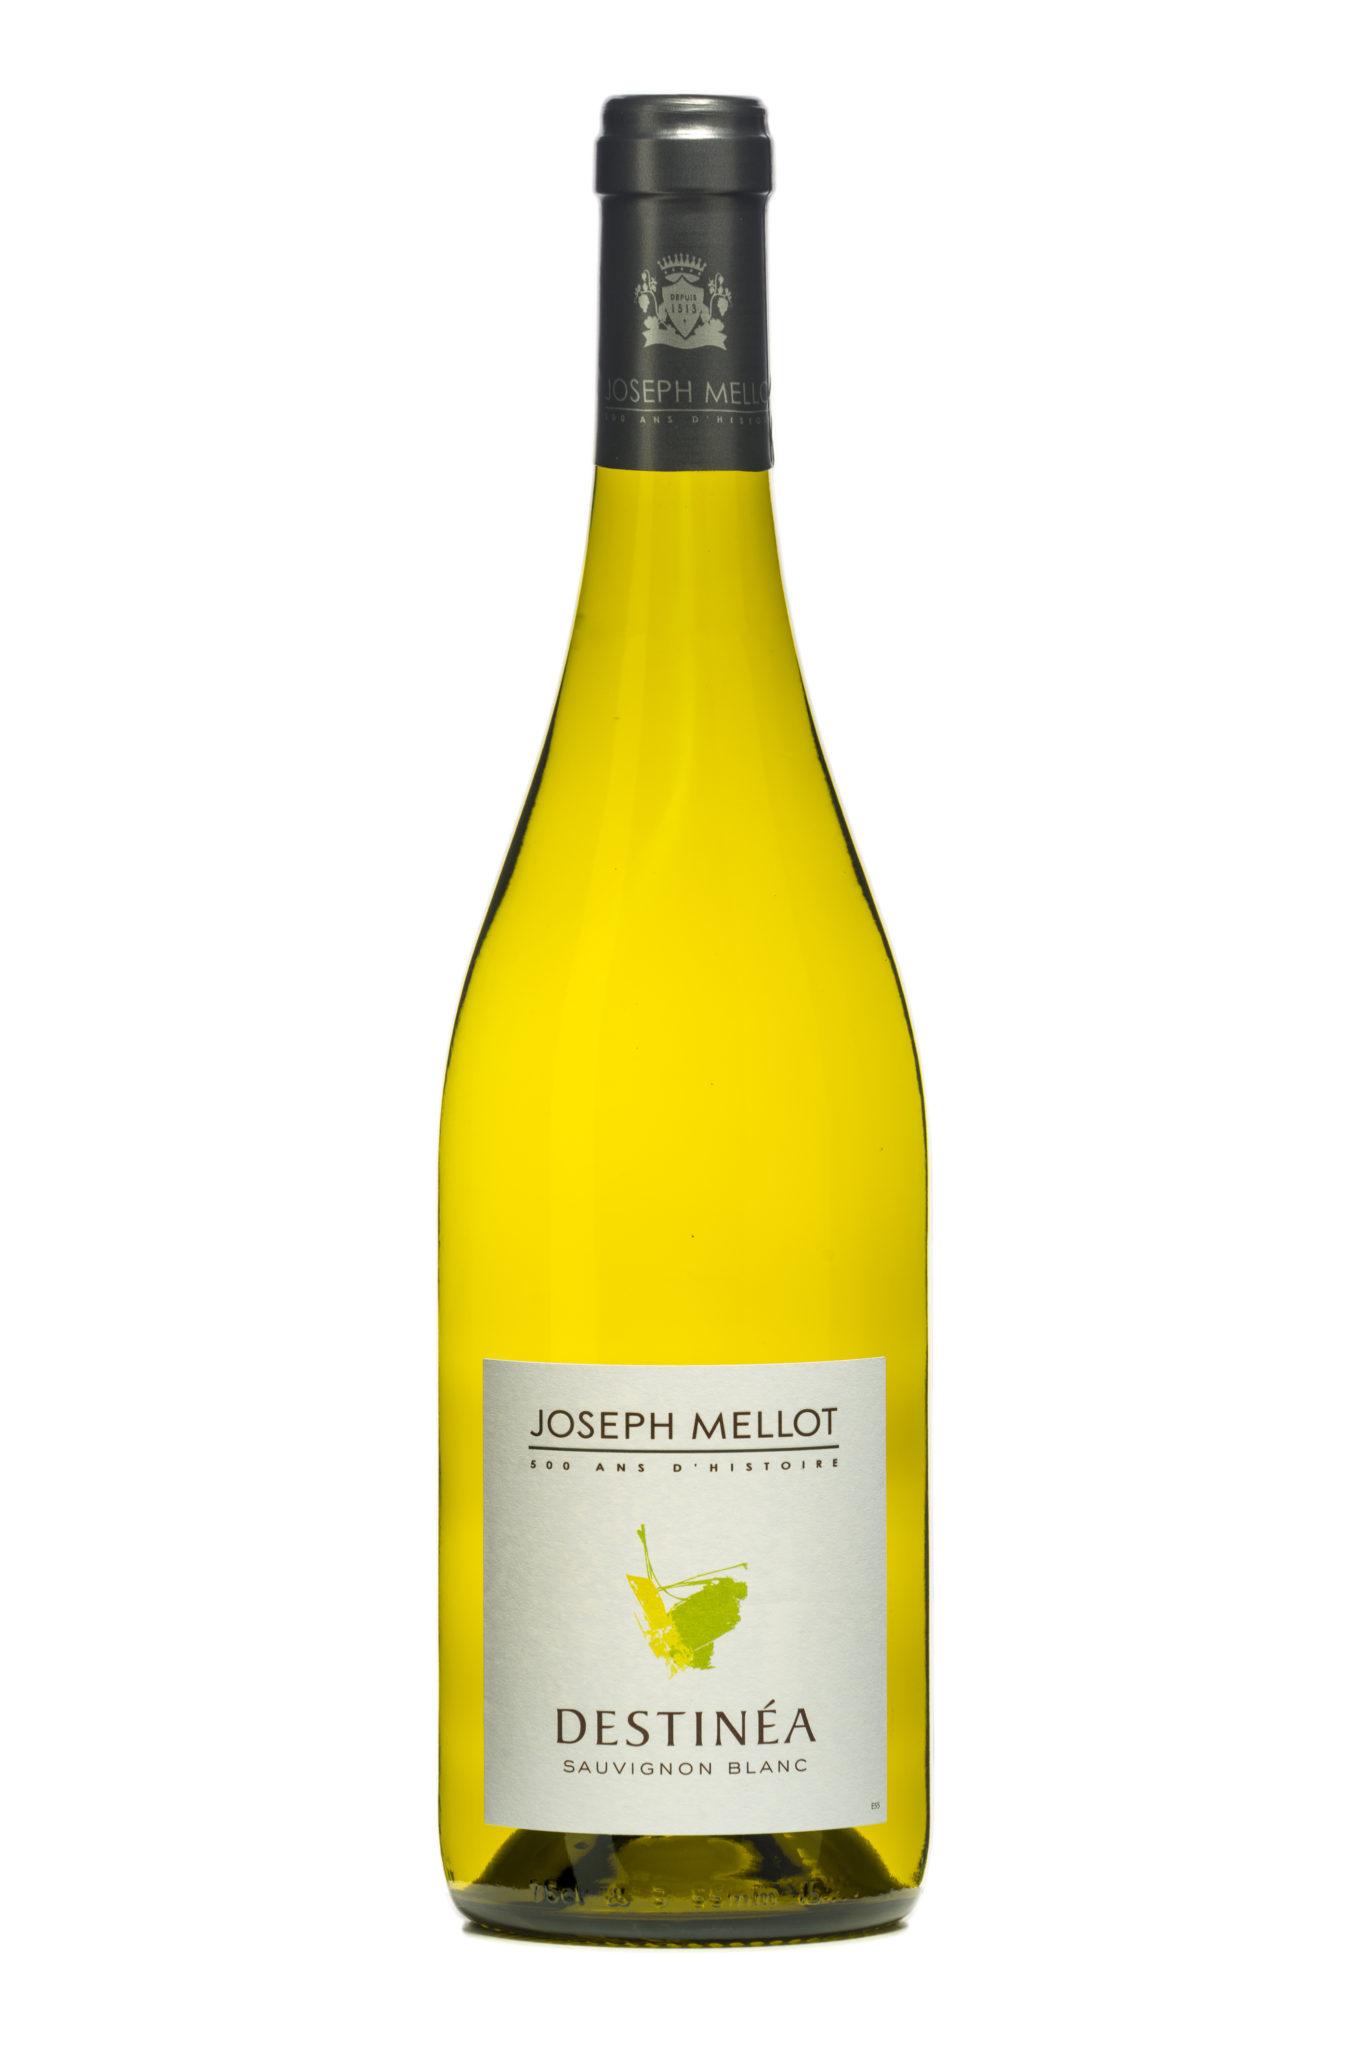 Joseph Mellot - IGP VAL DE LOIRE Sauvignon blanc<br />DESTINEA